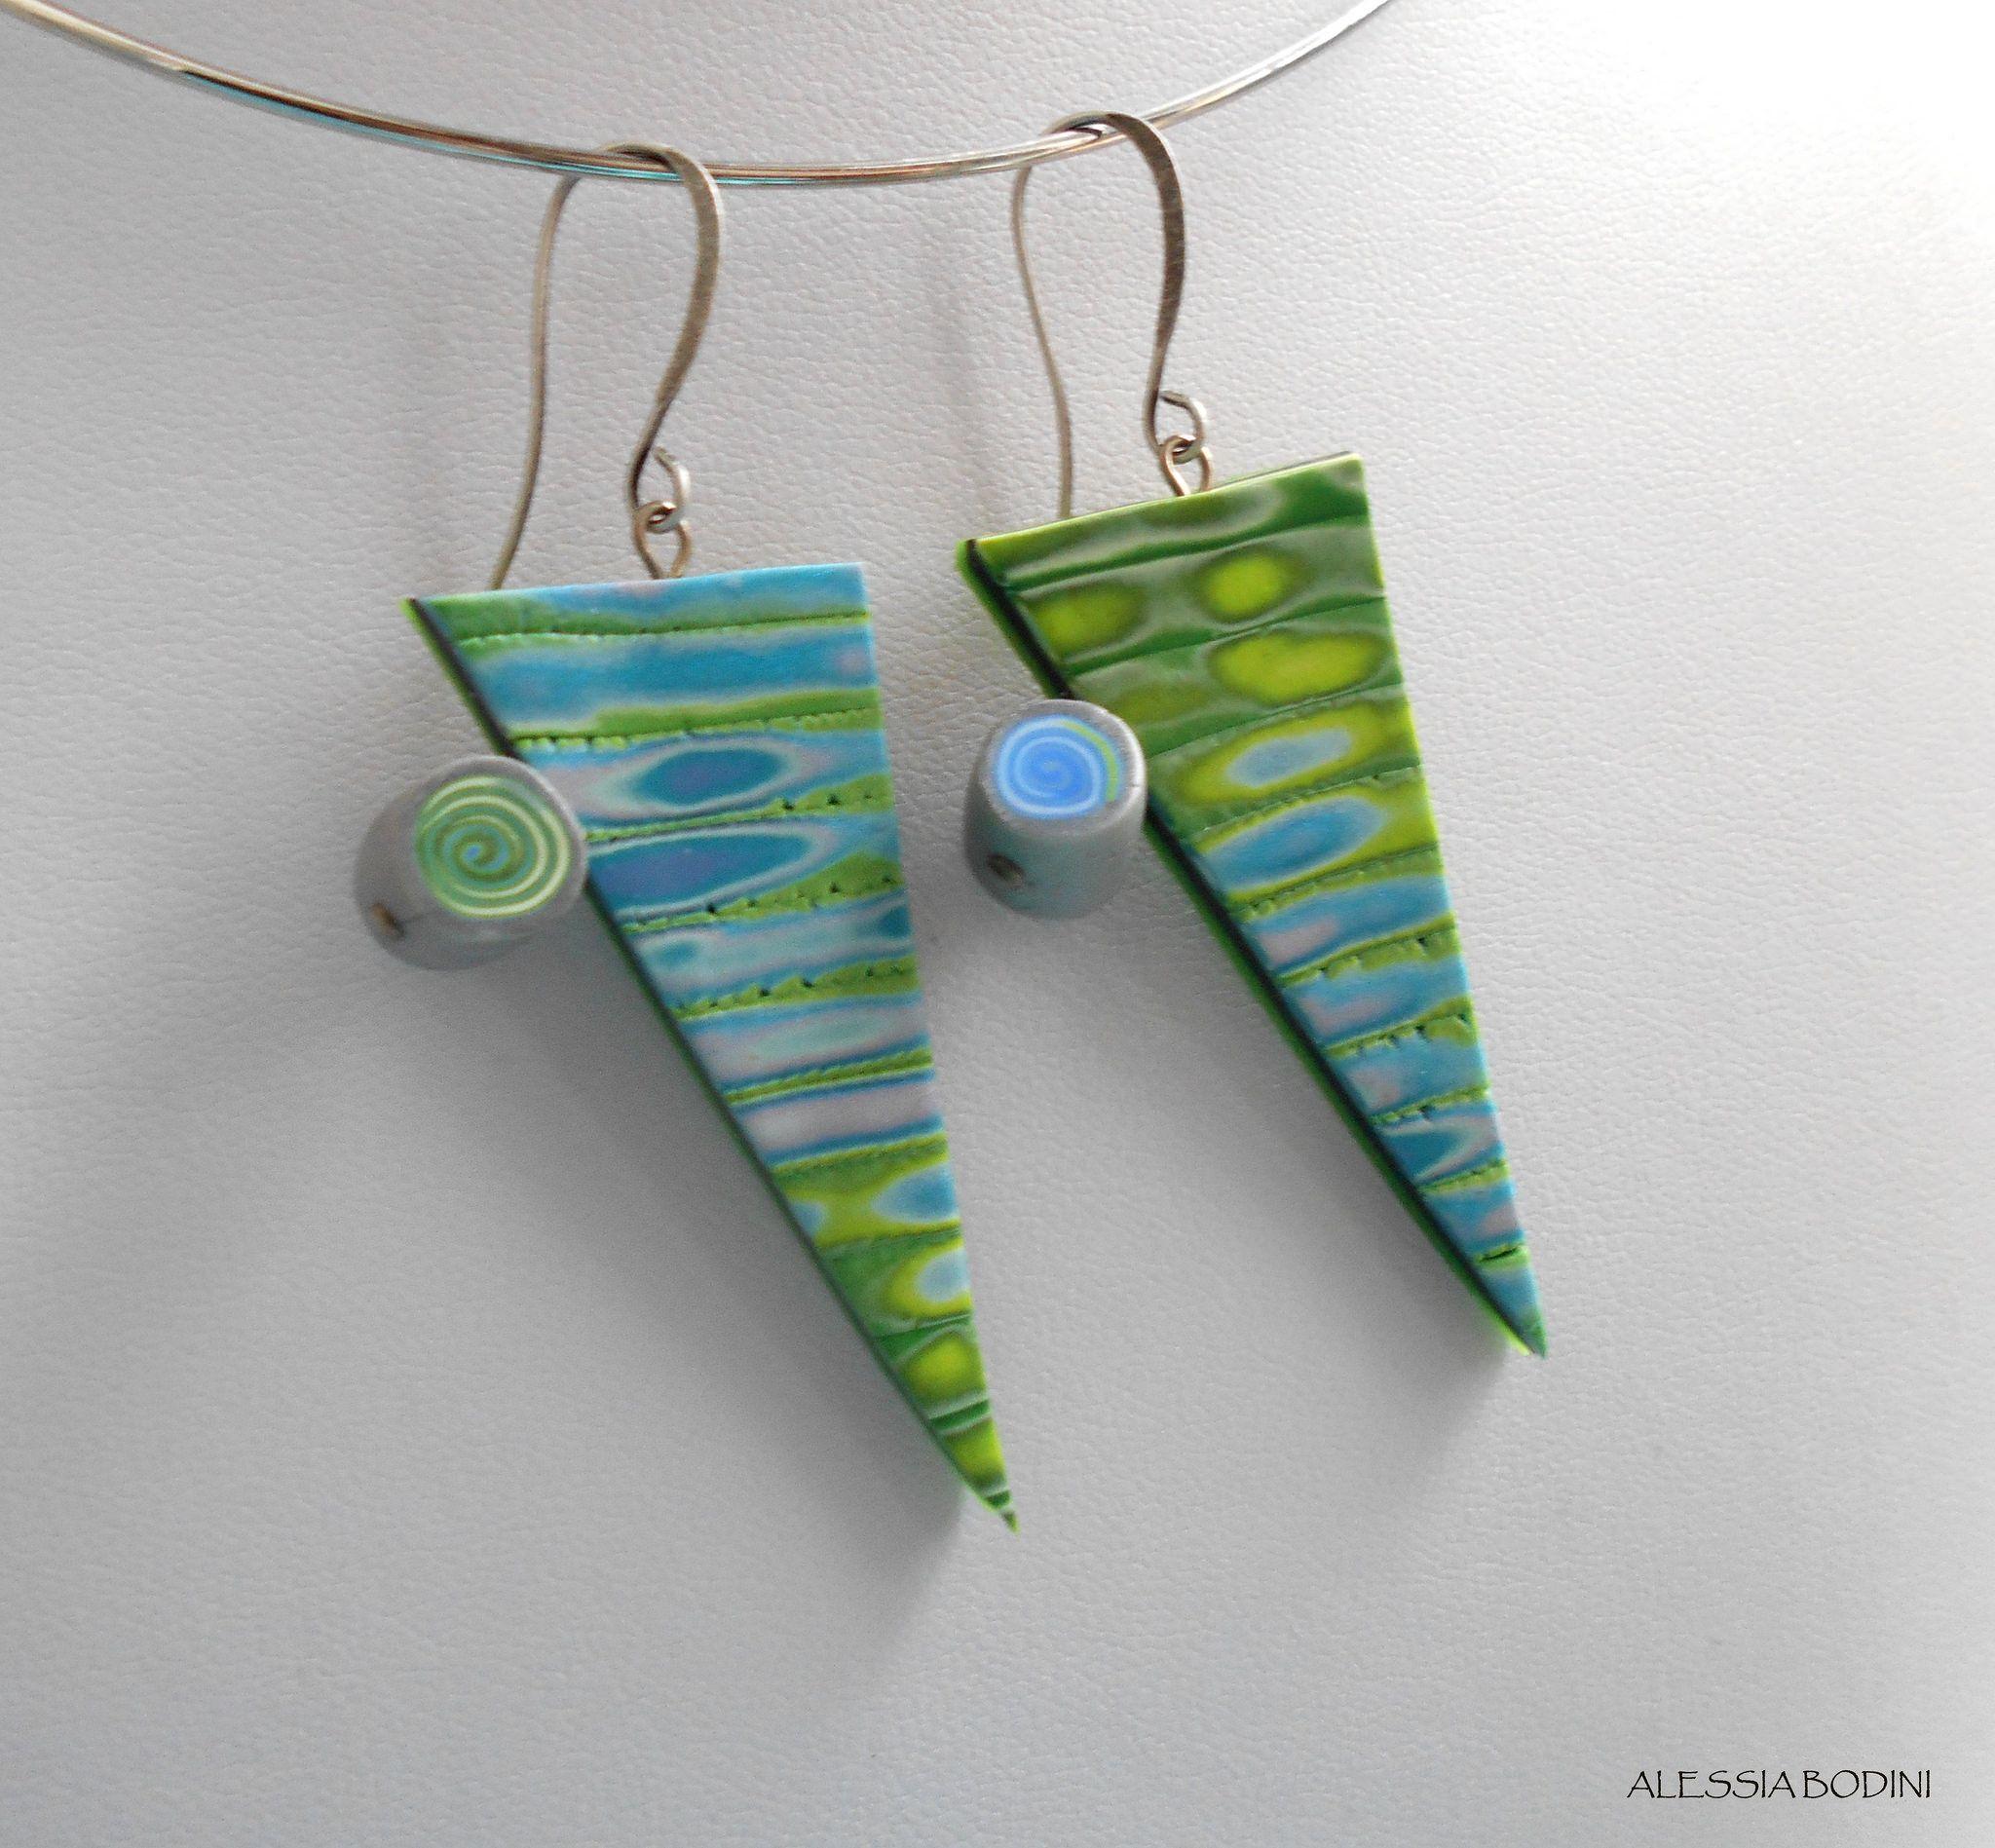 https://flic.kr/p/zkkAcQ | Green triangles | Polymer clay earrings